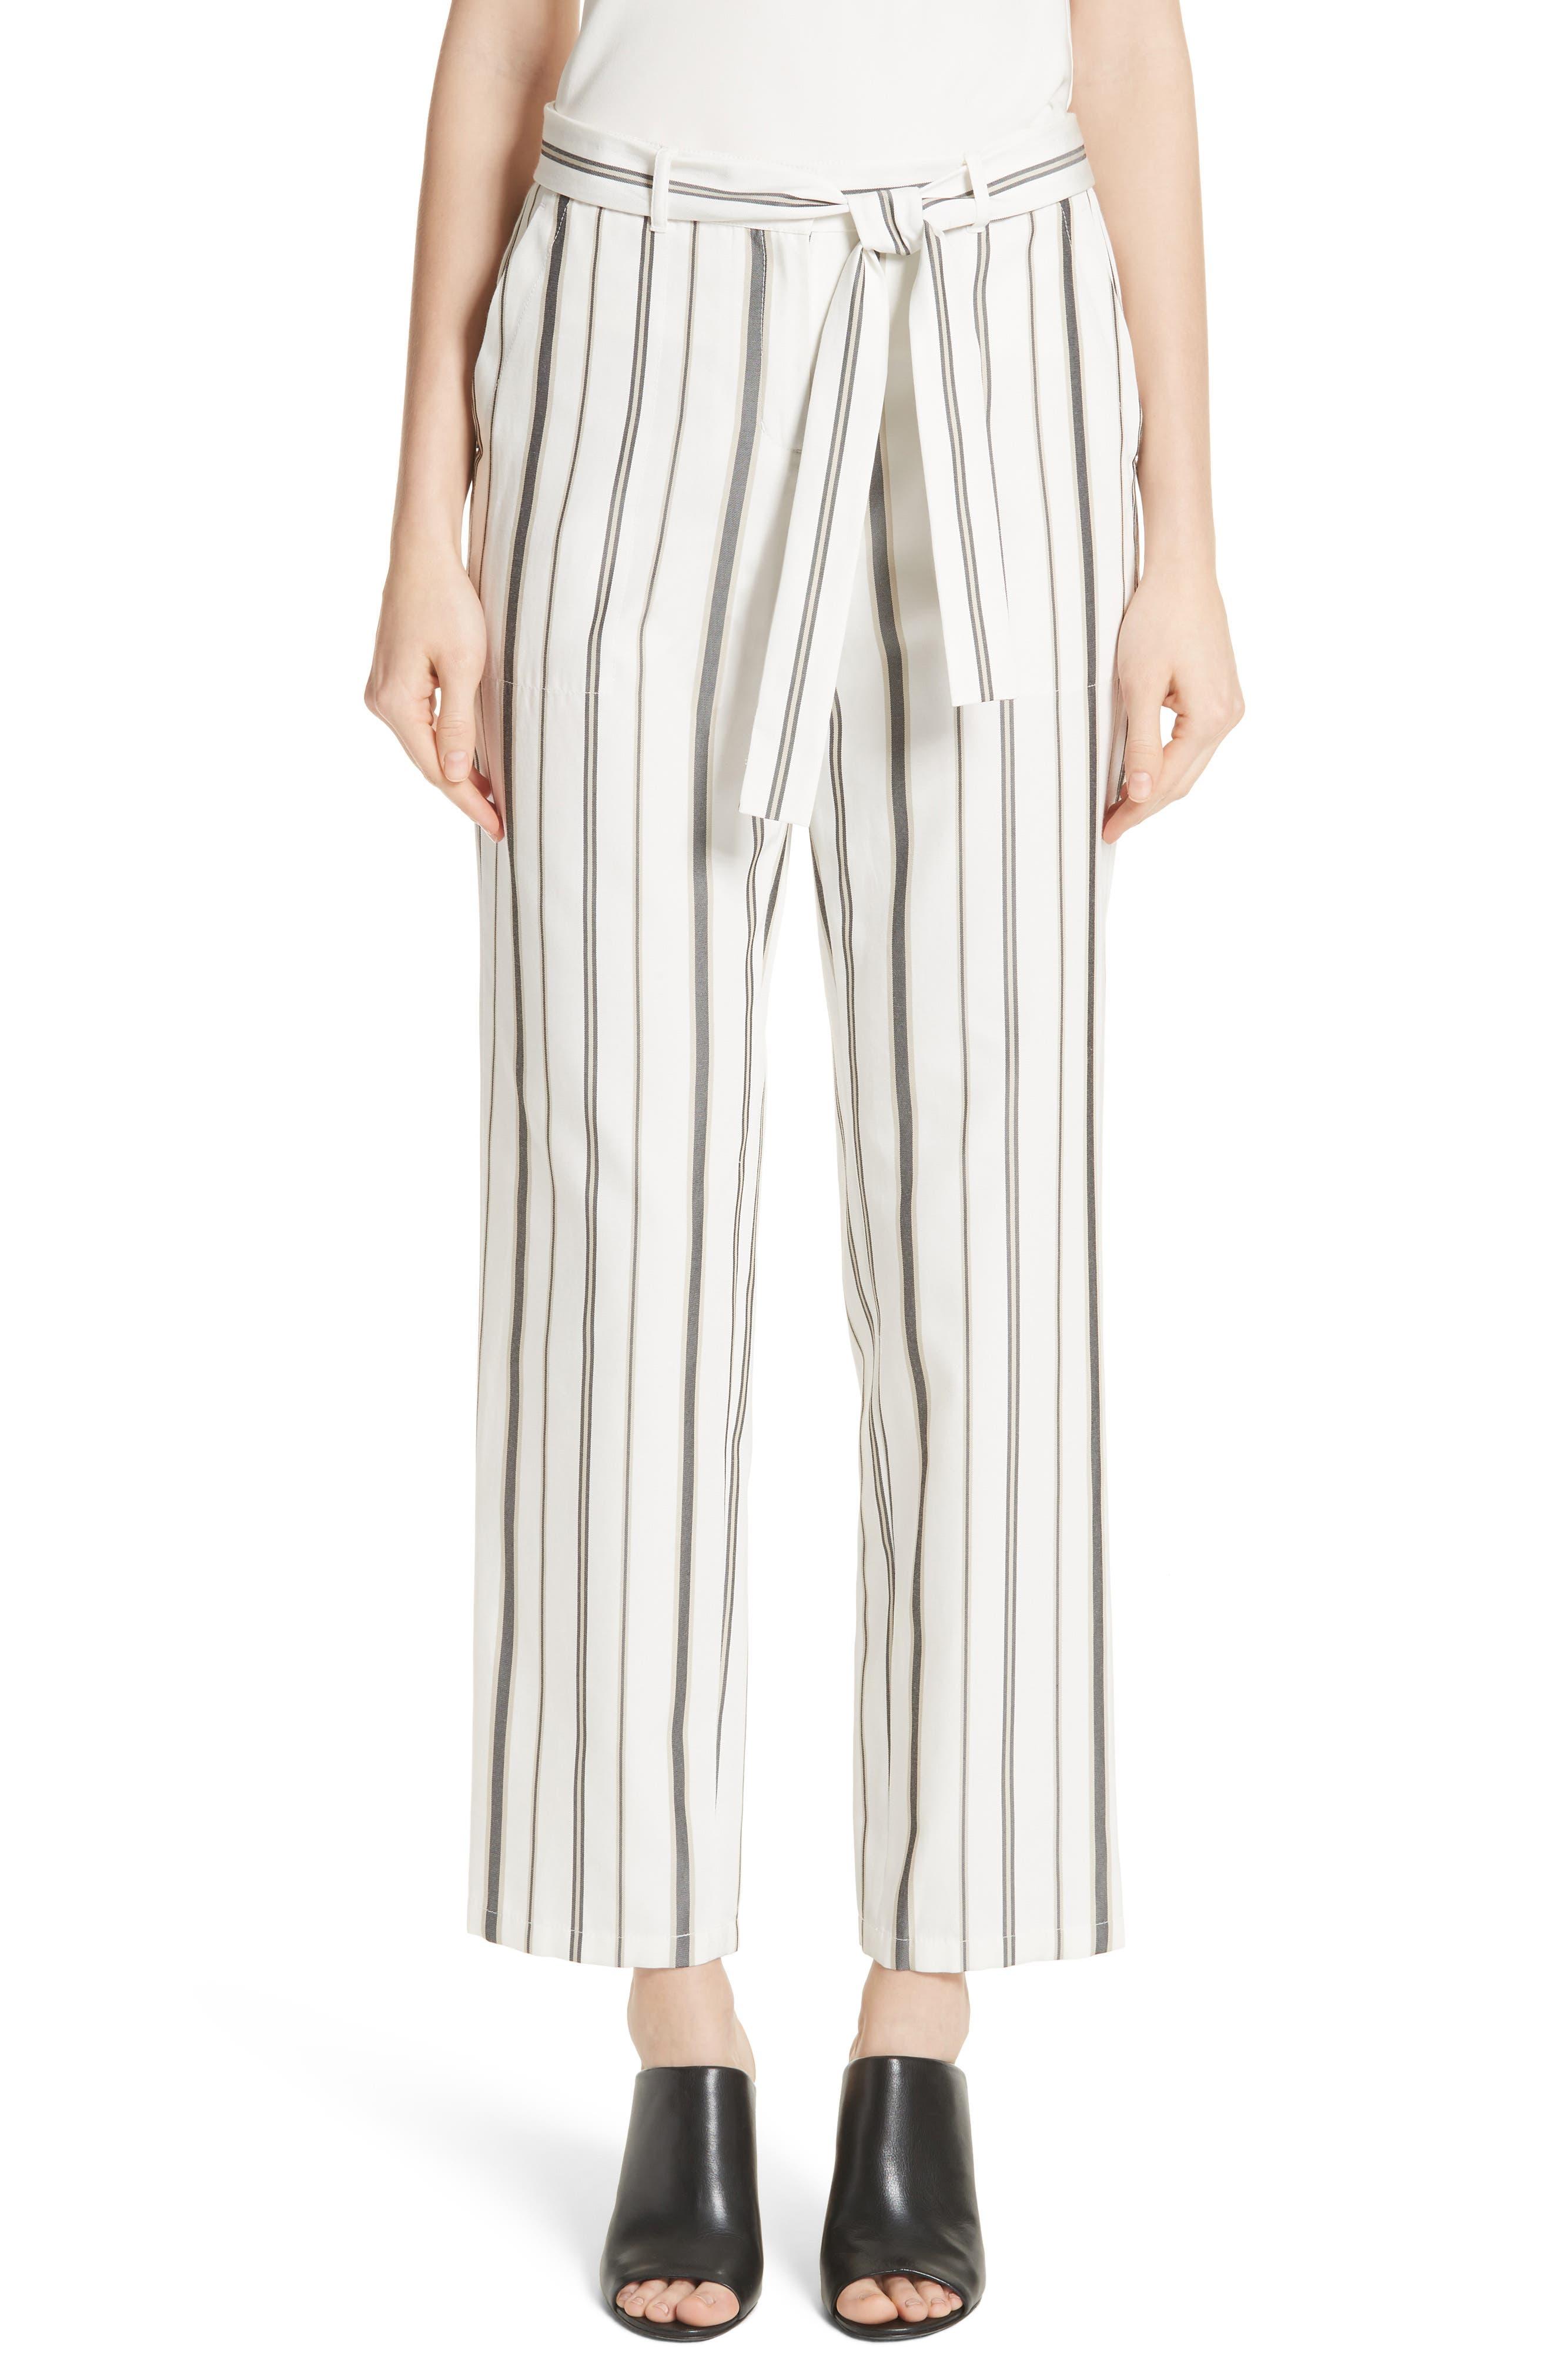 Fulton Gallant Stripe Pants,                         Main,                         color, CLOUD MULTI